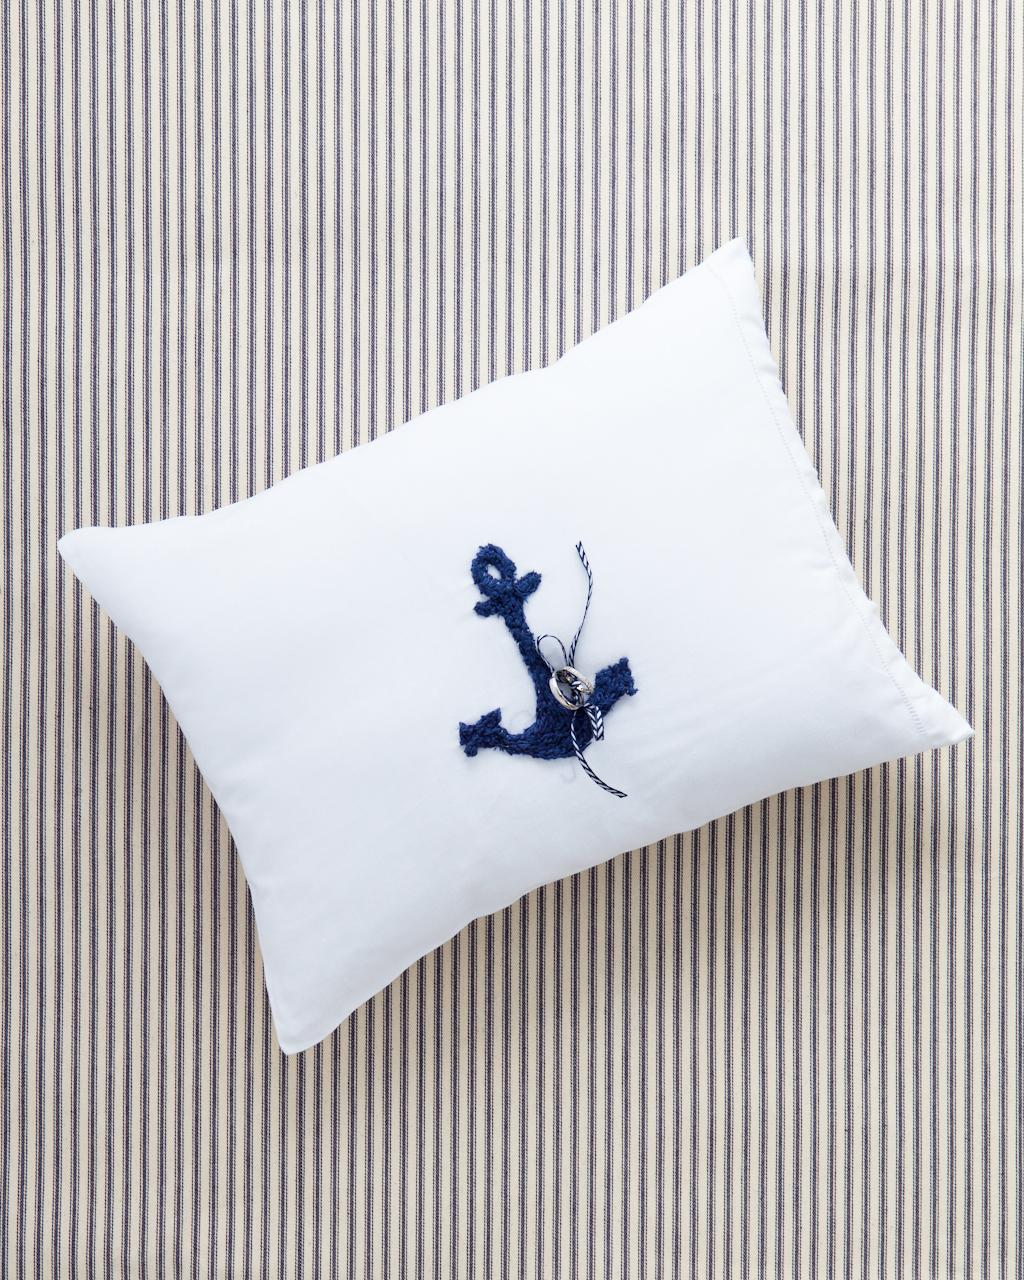 gillian-william-ring-pillow-0009-wd109007.jpg